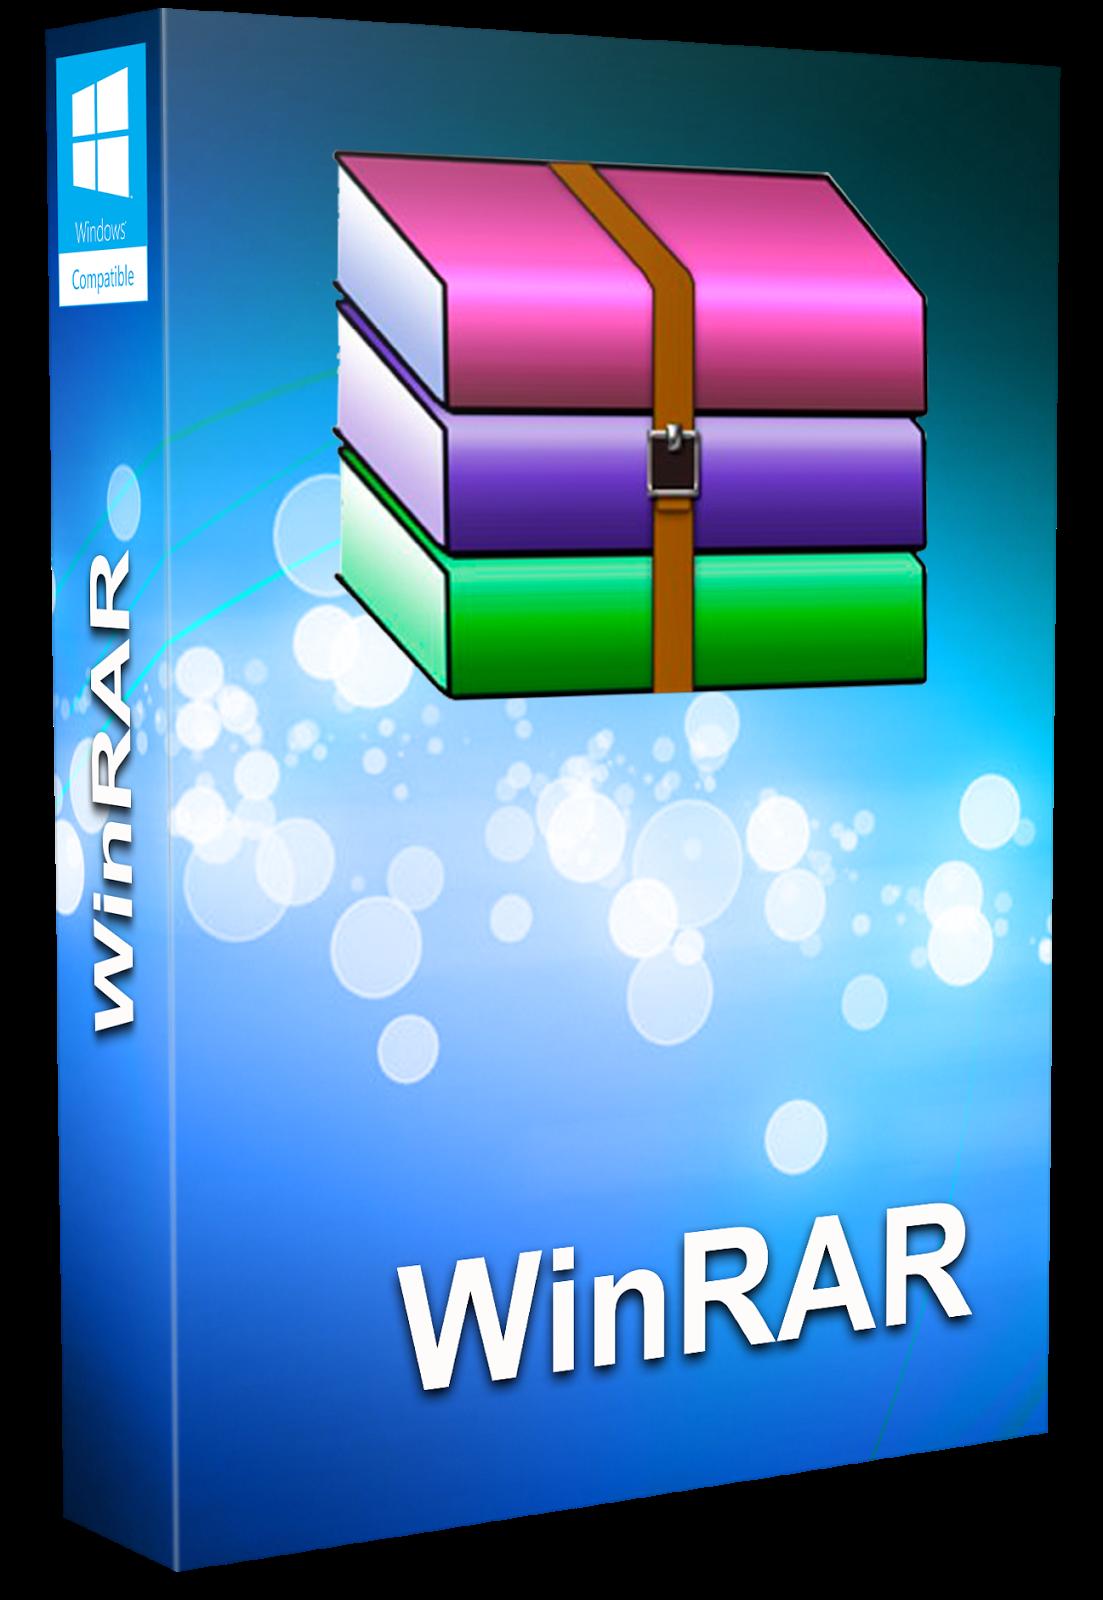 download winrar 4.20 64 bit full crack